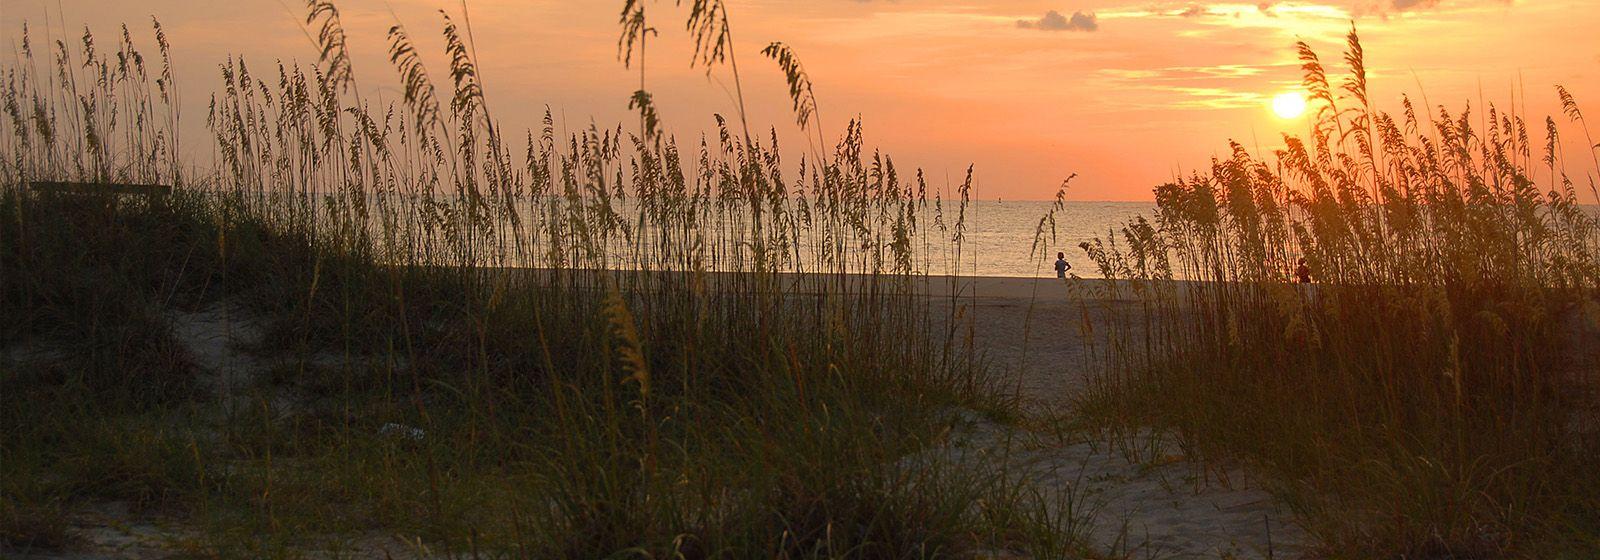 How sea oats make beautiful beaches possible